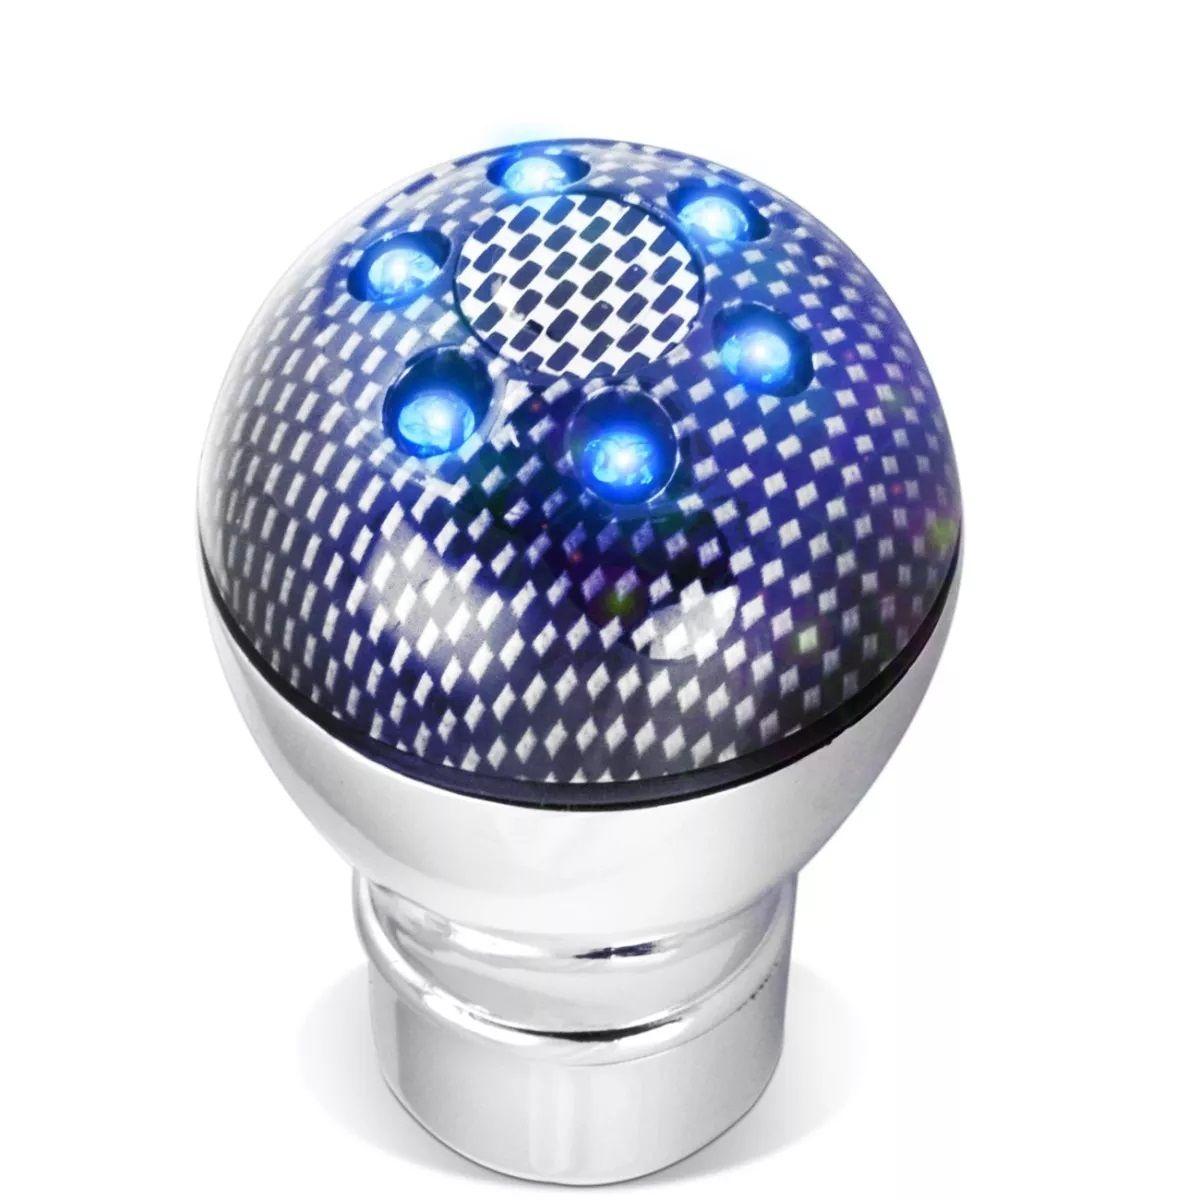 Bola Manopla de Cambio Led Neon Azul 3 Efeitos Carbon Tuning